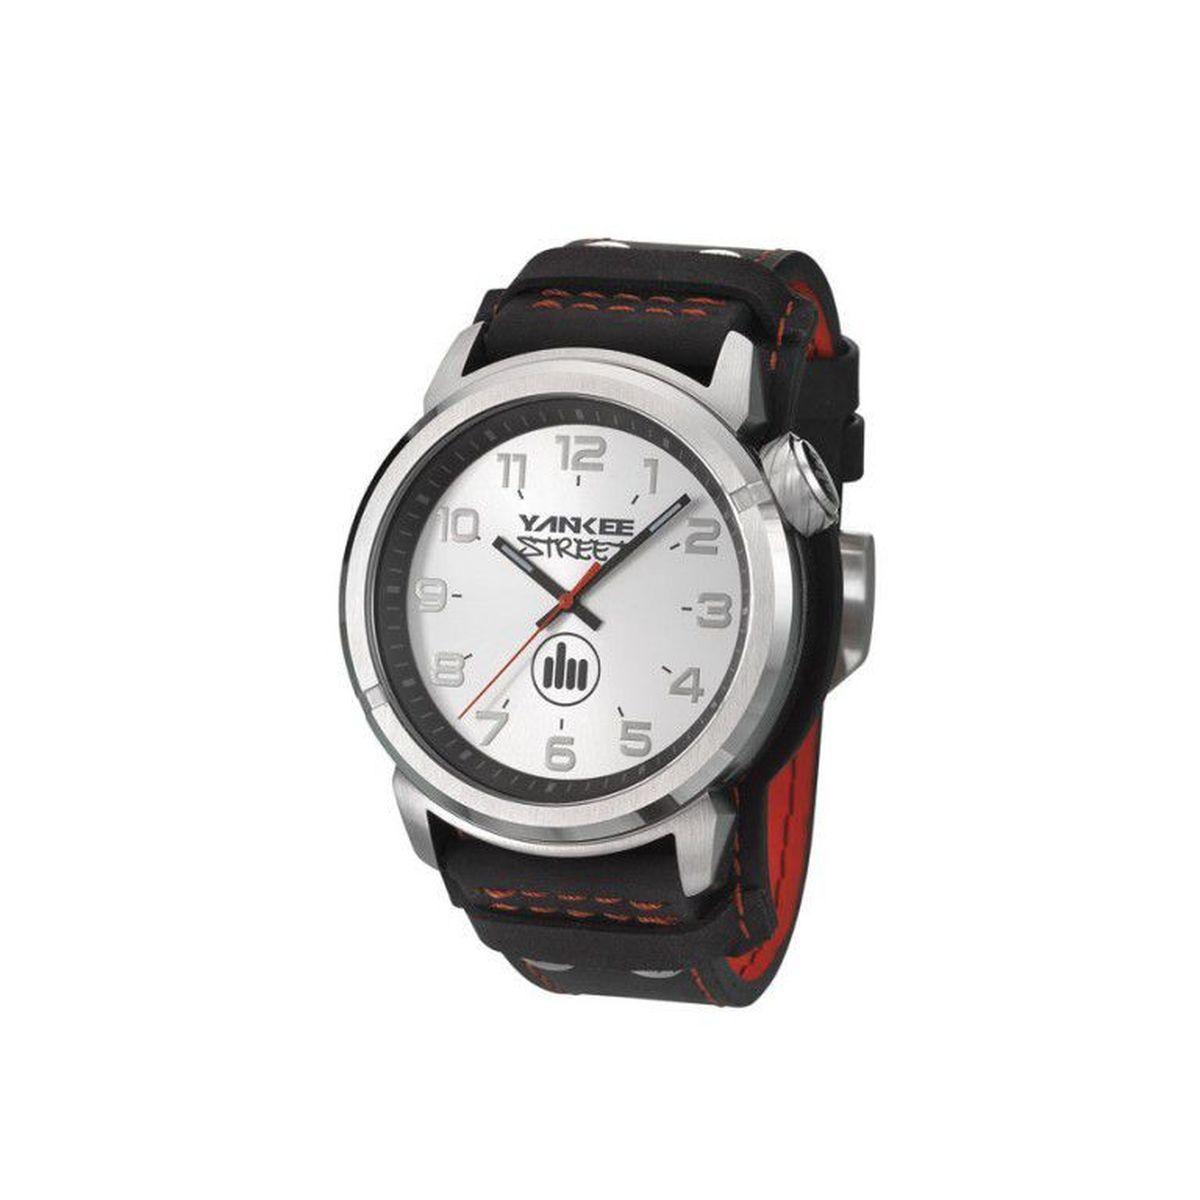 Relógio de Pulso Masculino Black Angels YS30541Q